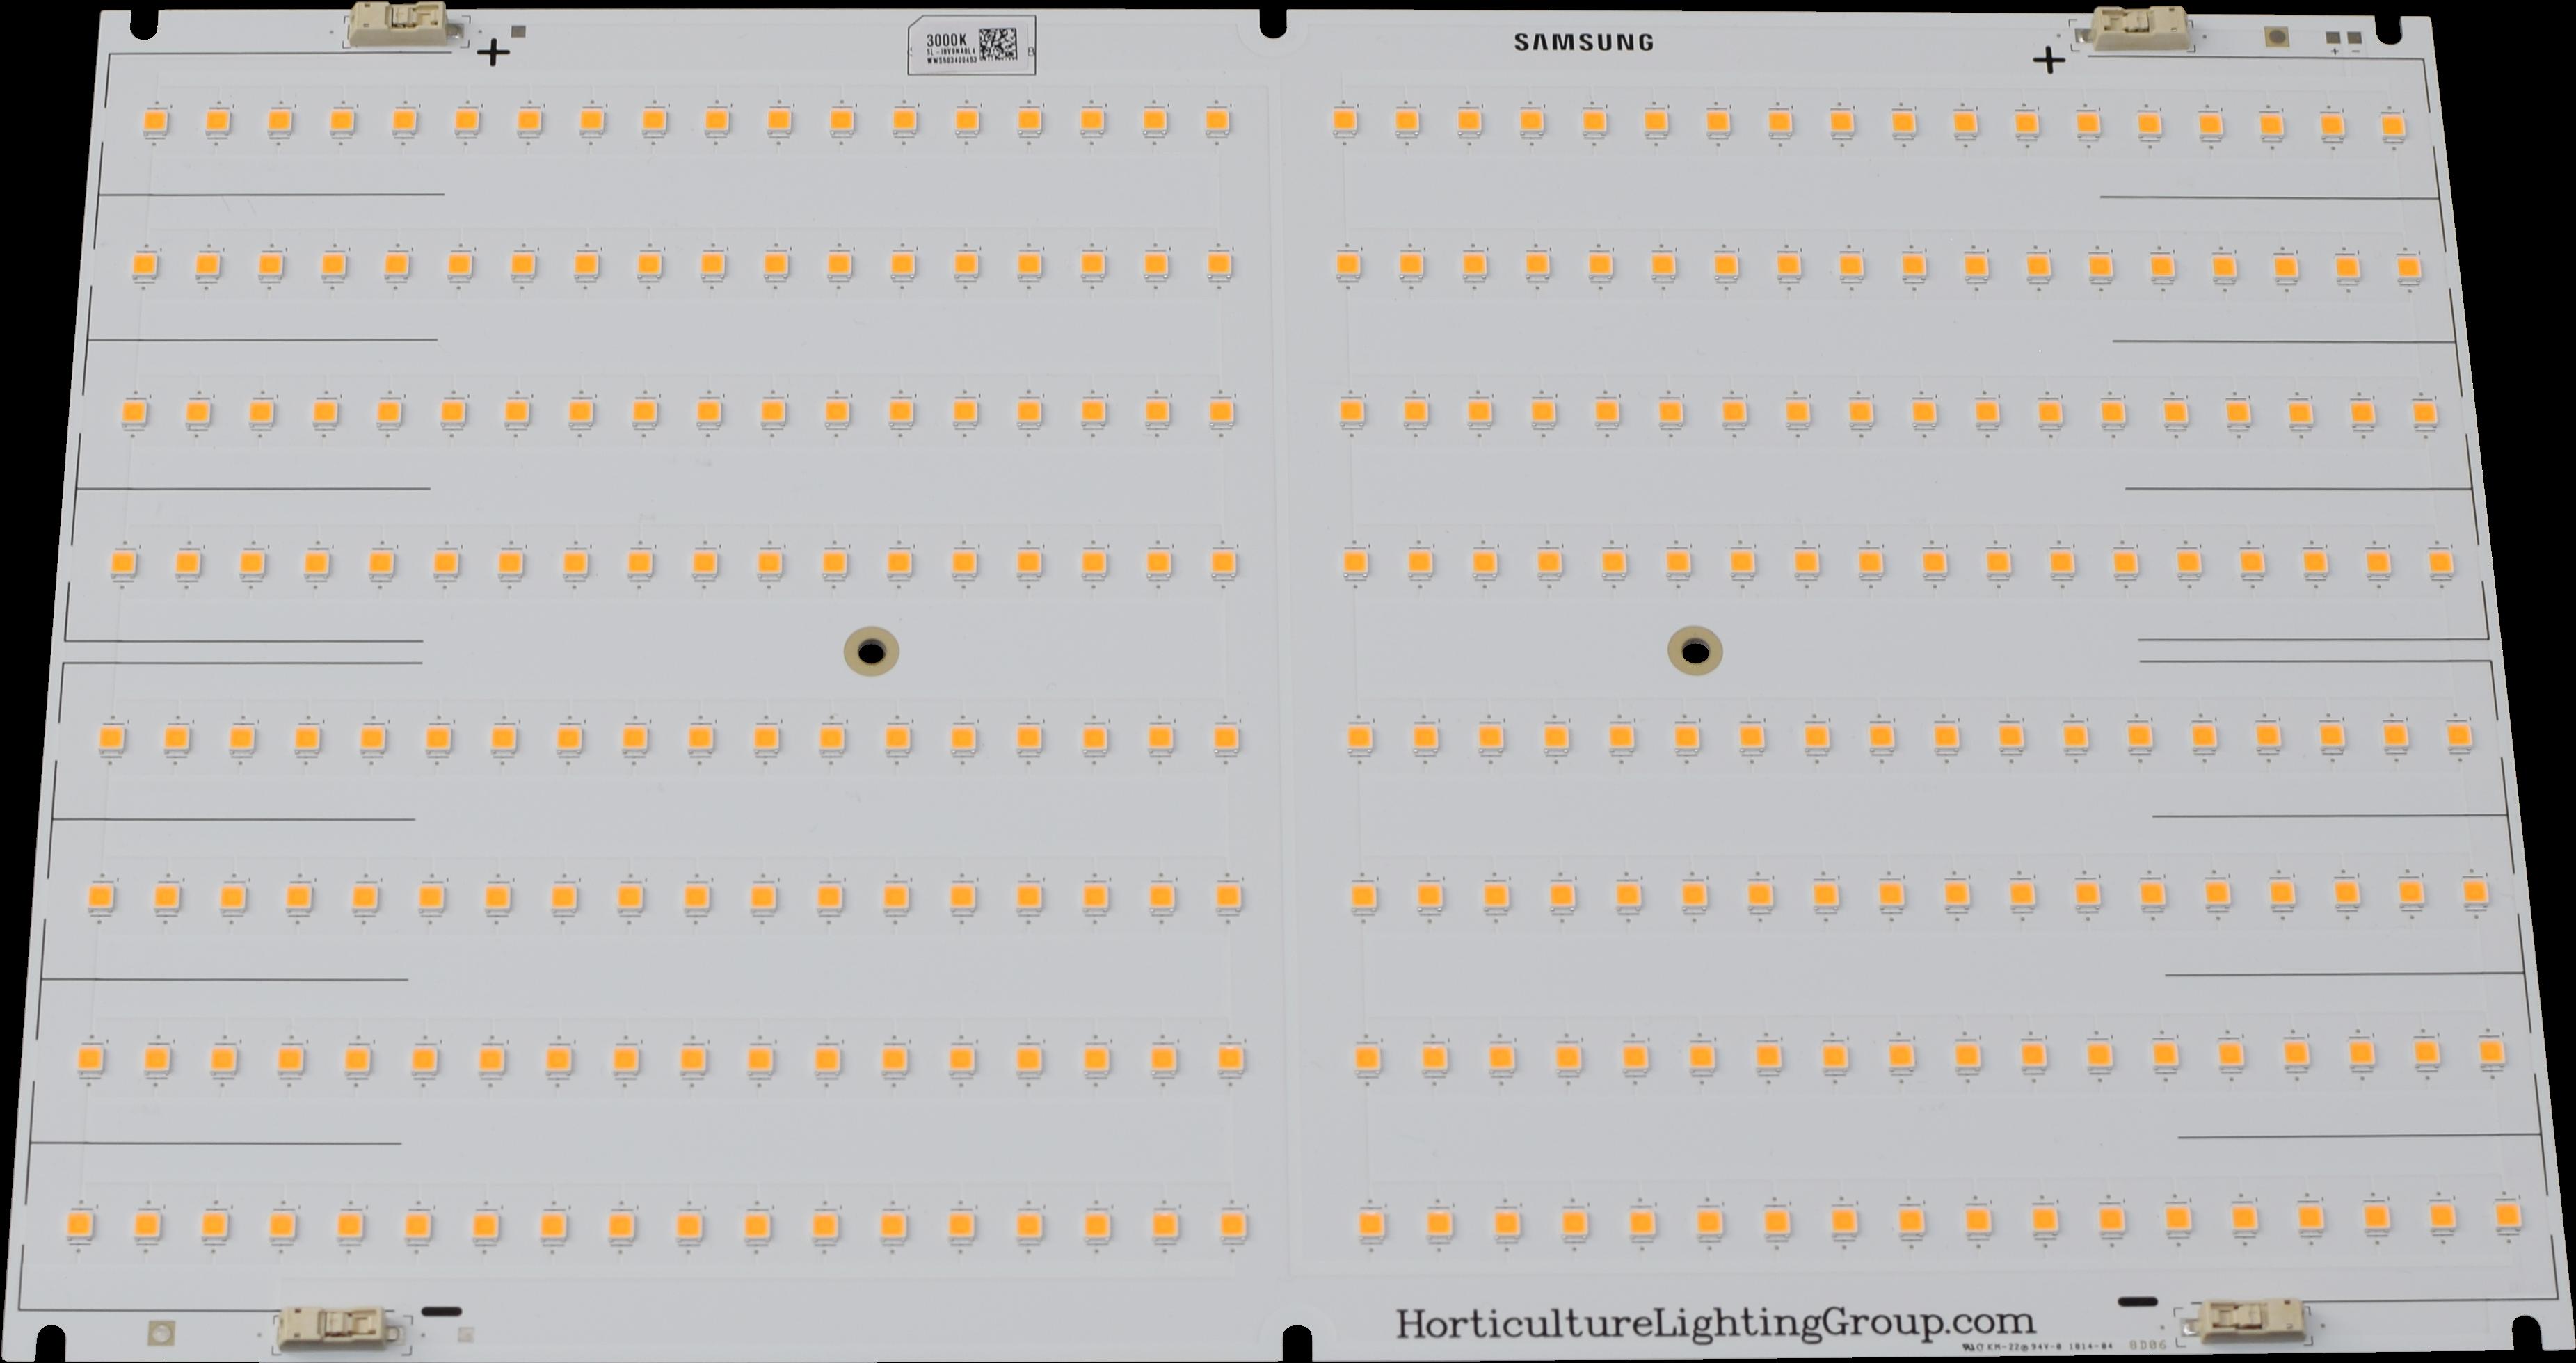 Download HD Qb288 V2 Quantum Board - Slope Transparent PNG Image